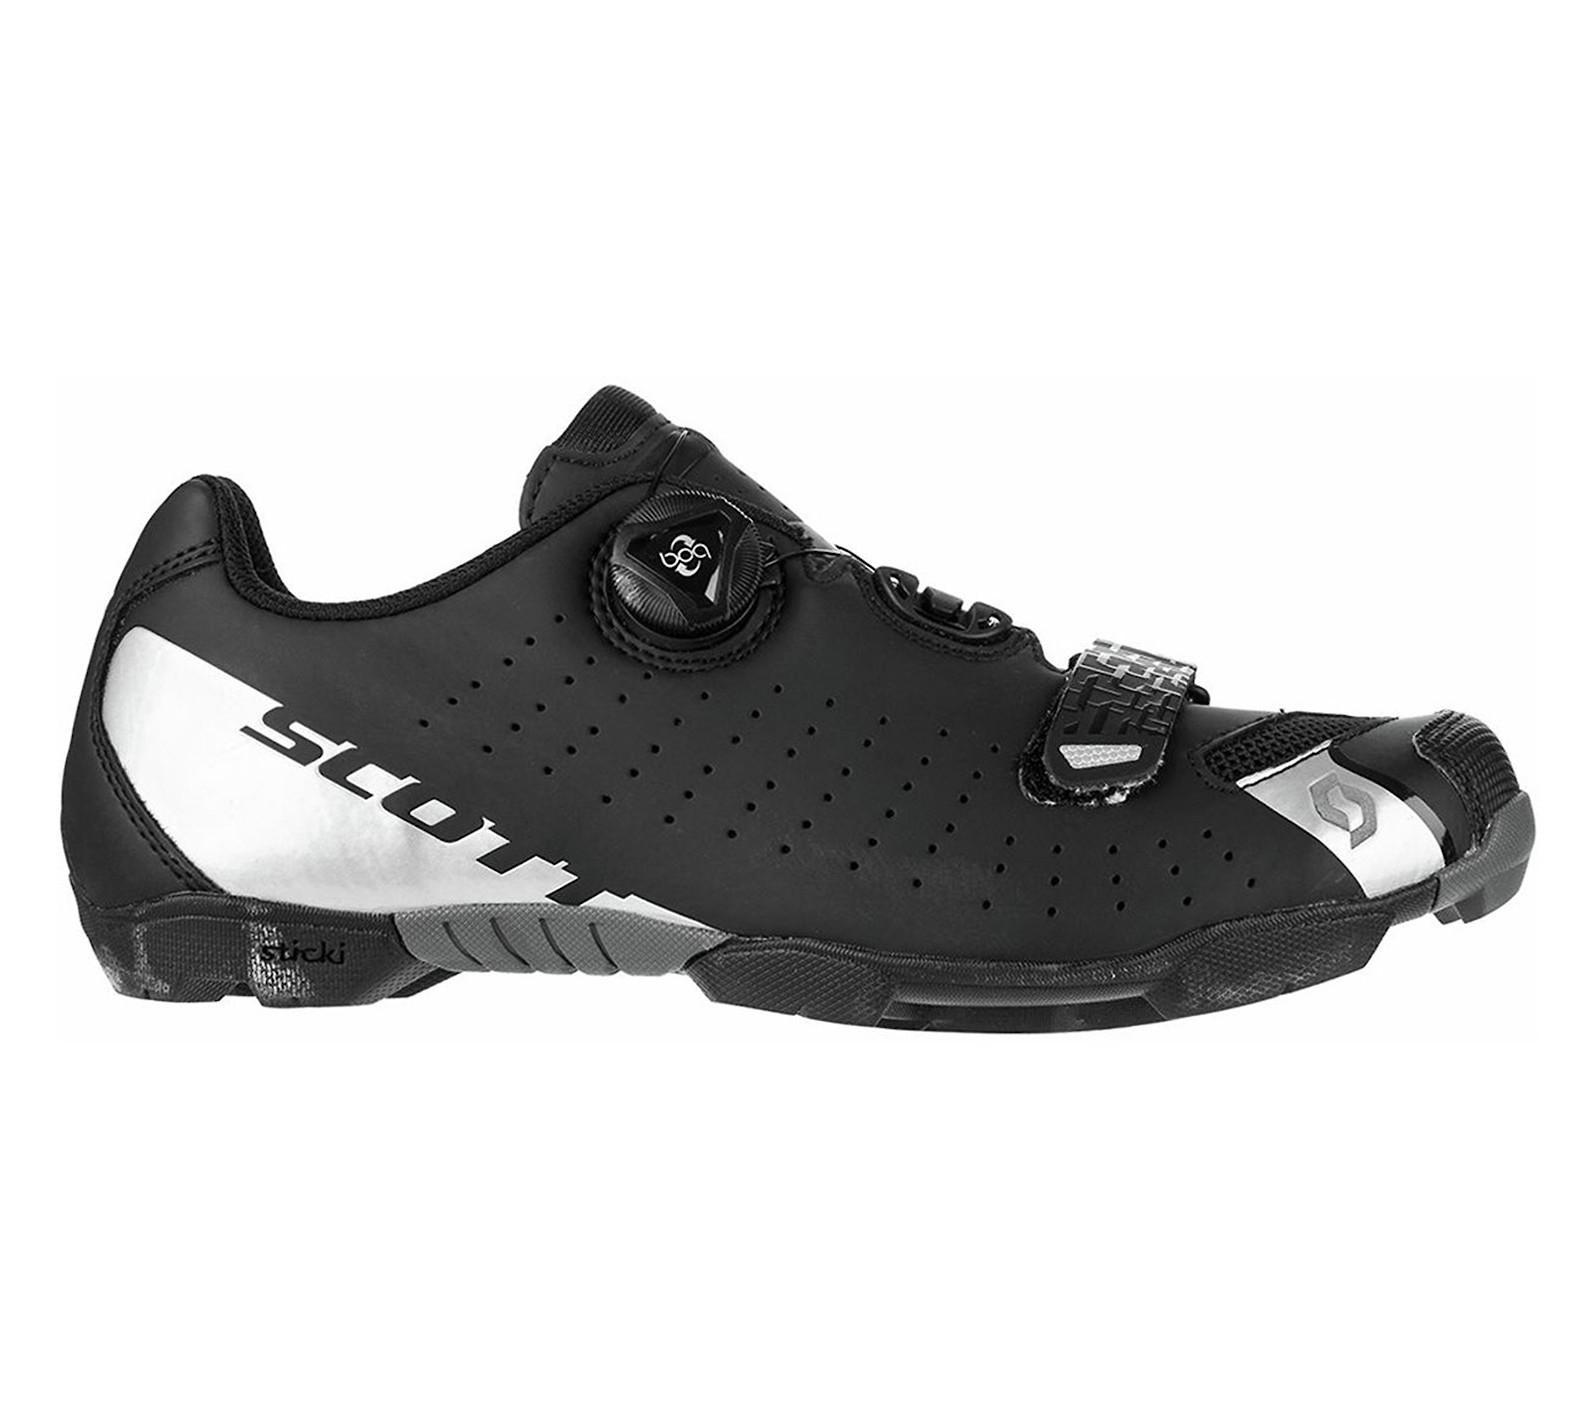 Scott Comp Boa shoe in matte black/silver